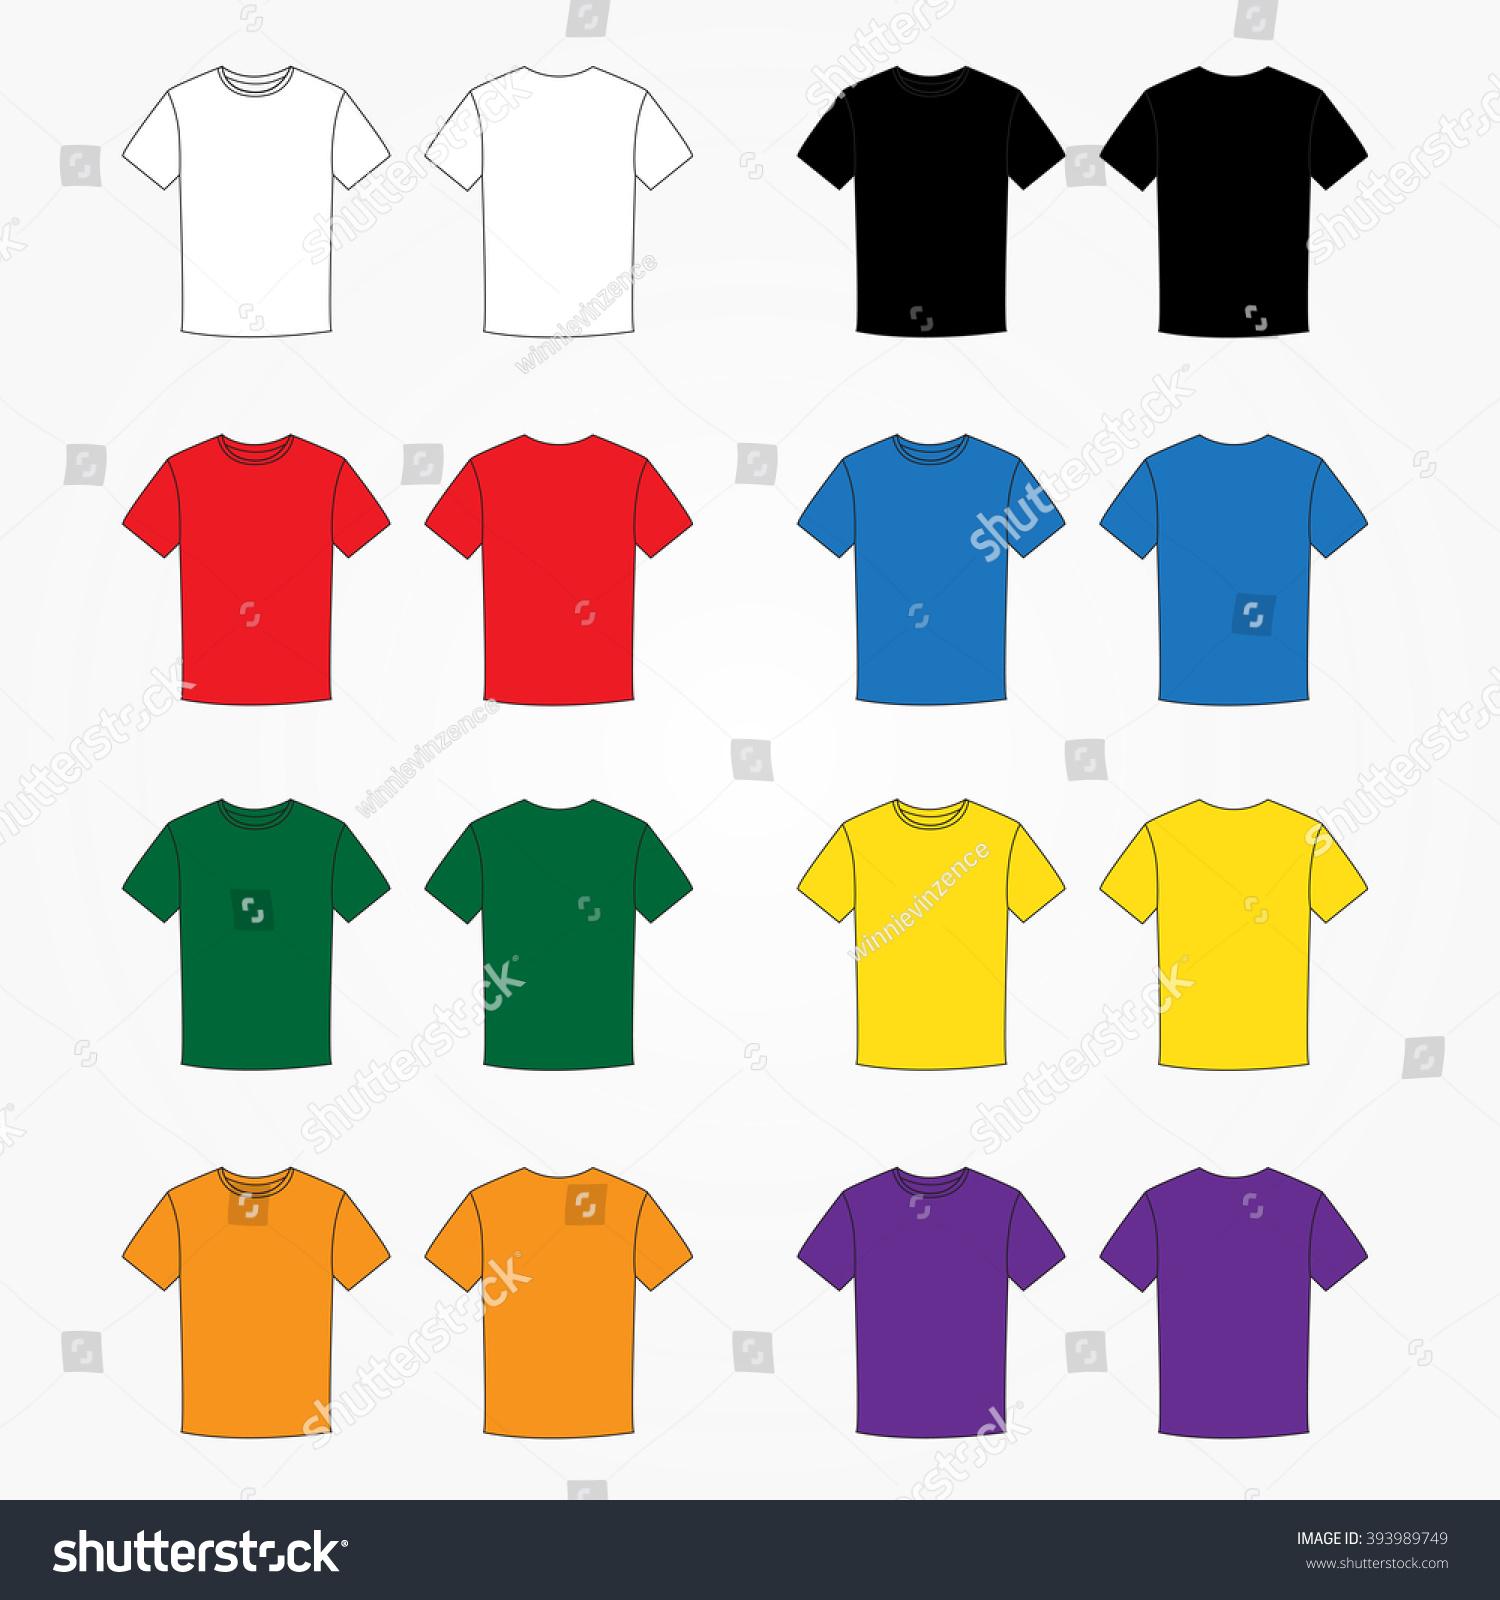 Color Tshirt Template Vector Stock Vector 393989749 - Shutterstock